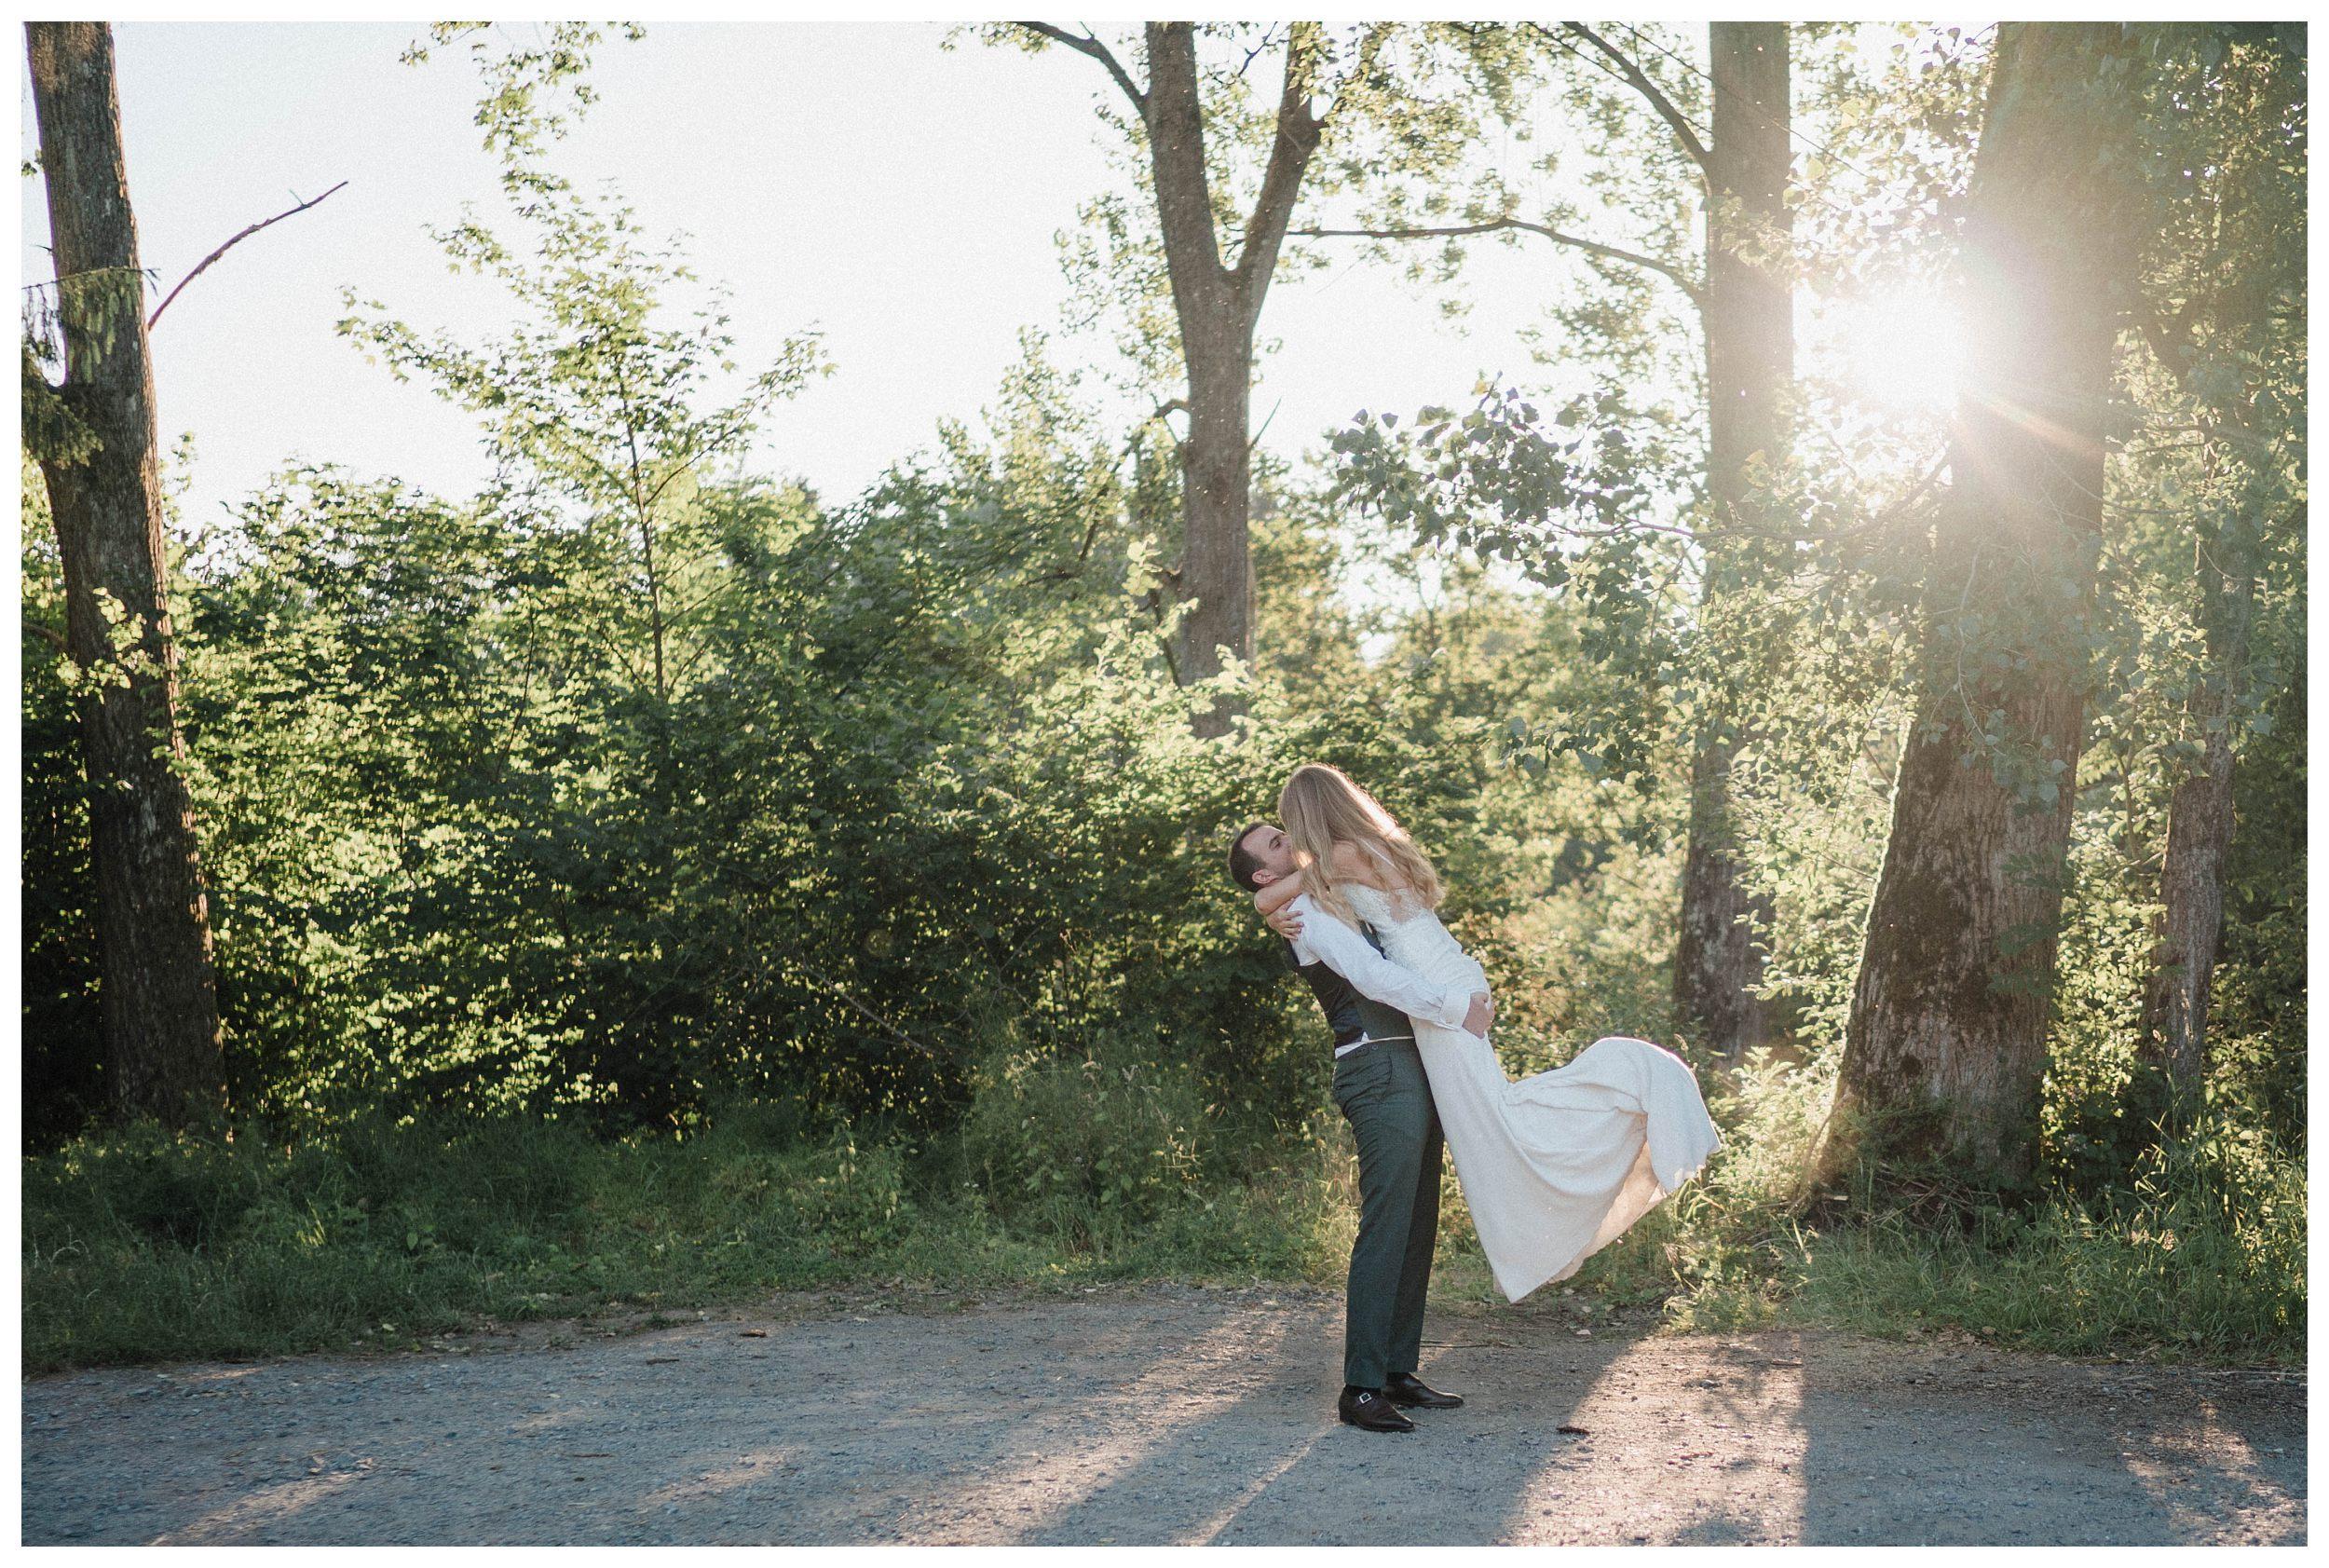 huwelijksfotograaf bruidsfotograaf destinationwedding huwelijksfotografie in ardennen nederland (82).jpg